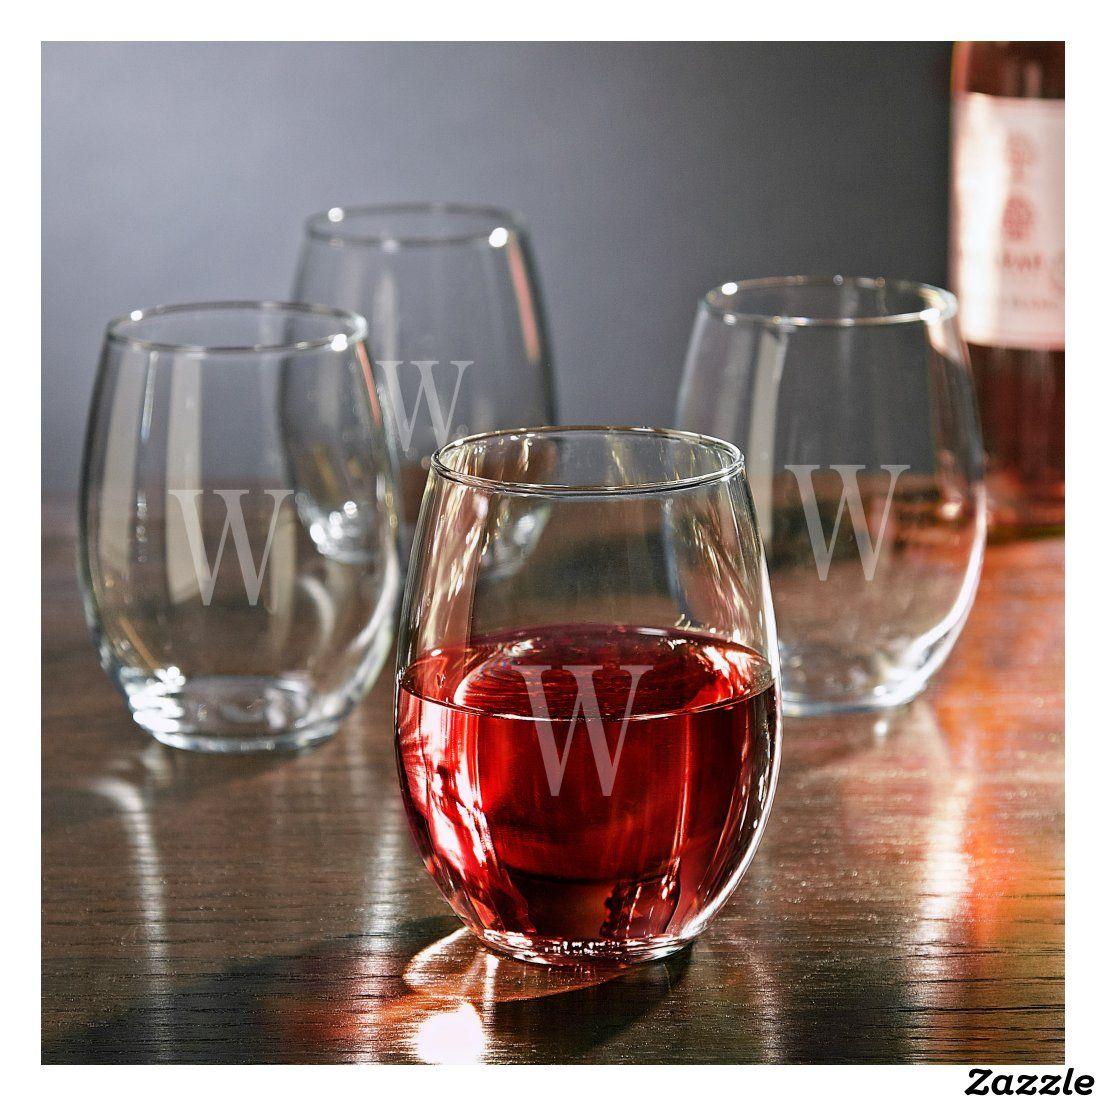 Set Of 4 Elegant Stemless White Wine Glasses Zazzle Com In 2020 White Wine Glasses Engraved Wine Glasses Hand Blown Wine Glasses